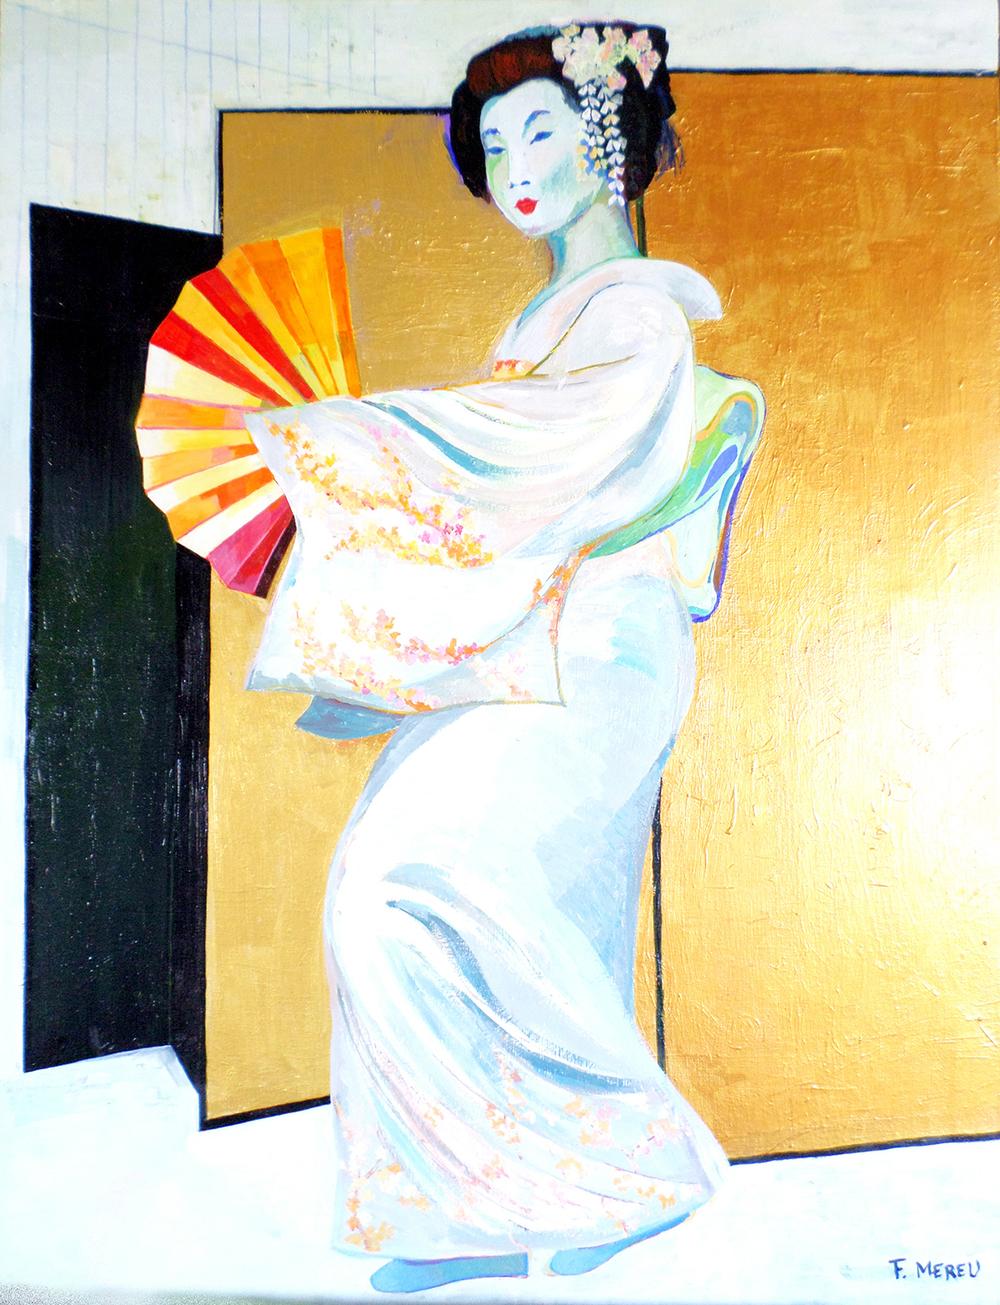 GEISHA CON VENTAGLIO, 70x90 cm